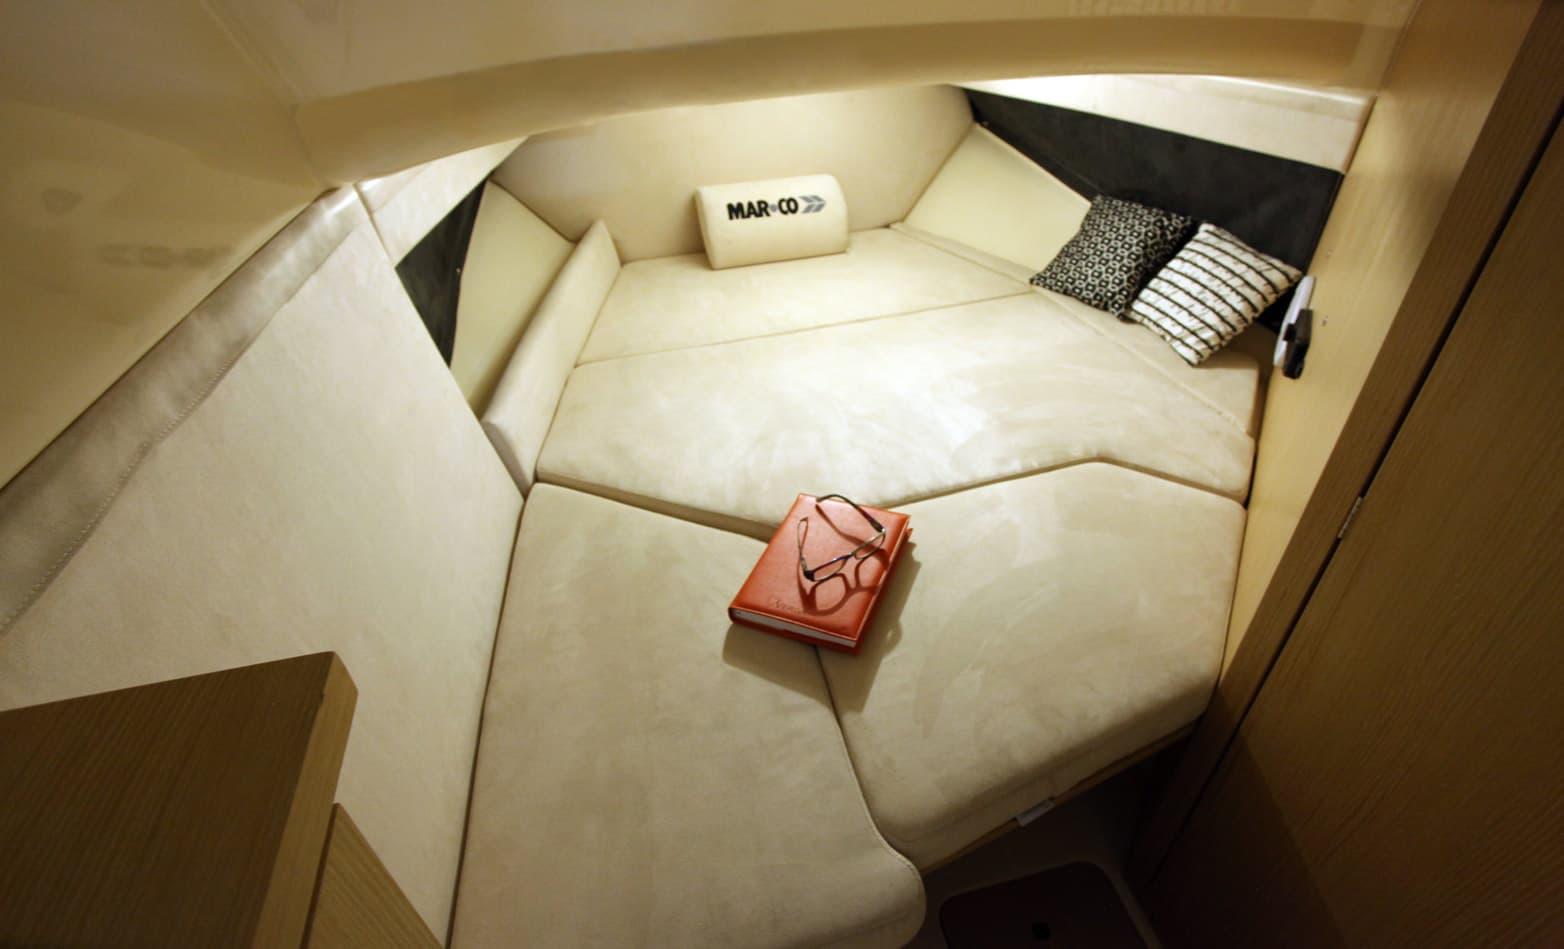 MAR.CO-e-motion-29-cabina.jpg